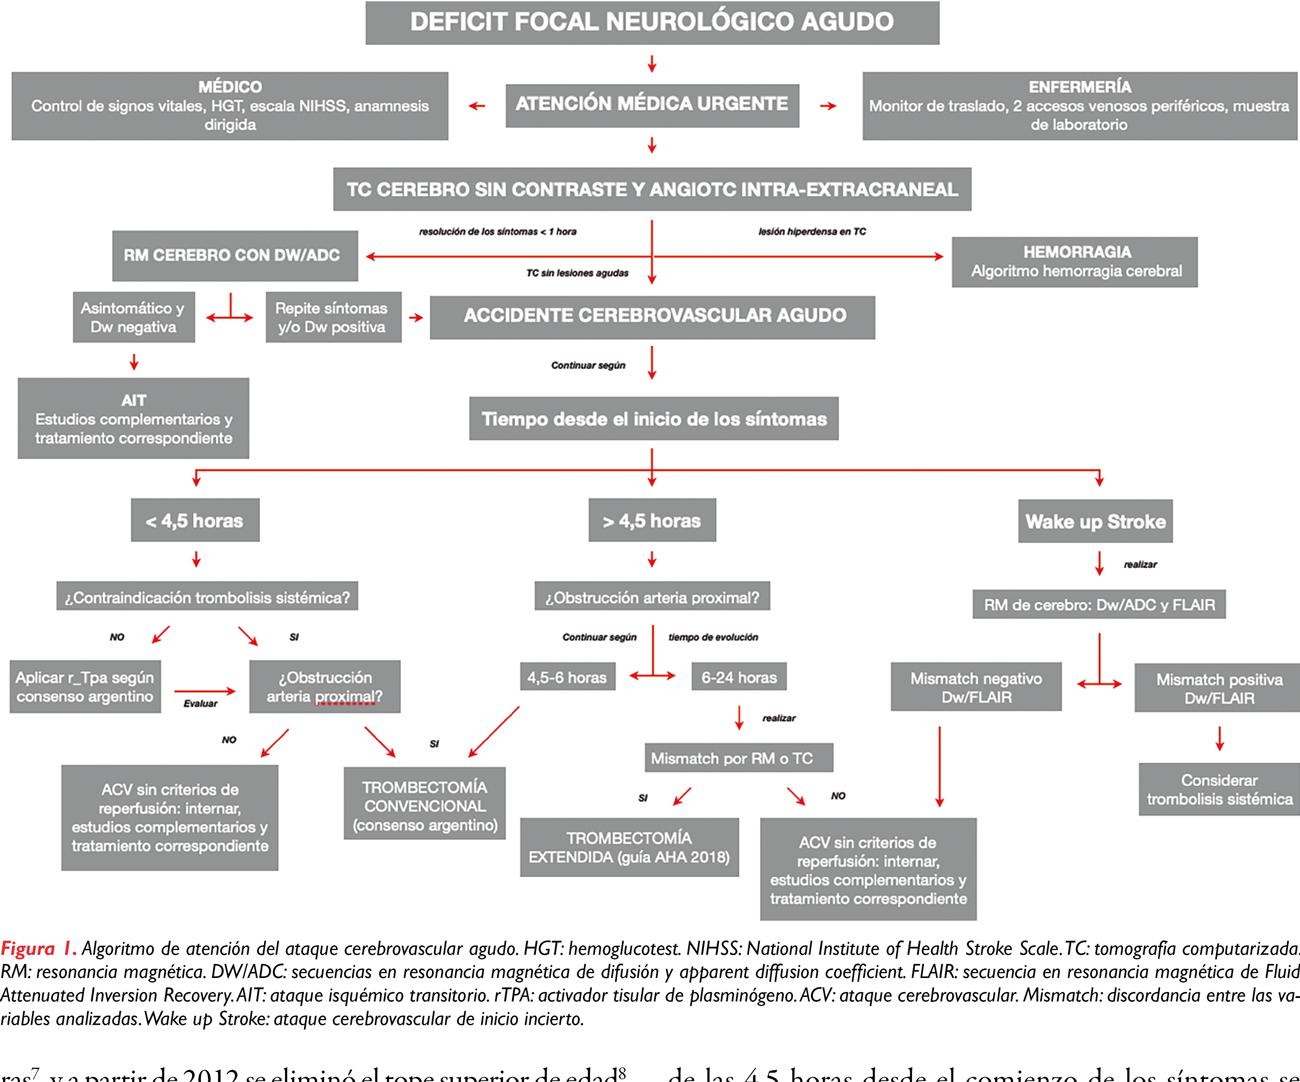 Manejo inicial del ataque cerebrovascular agudo